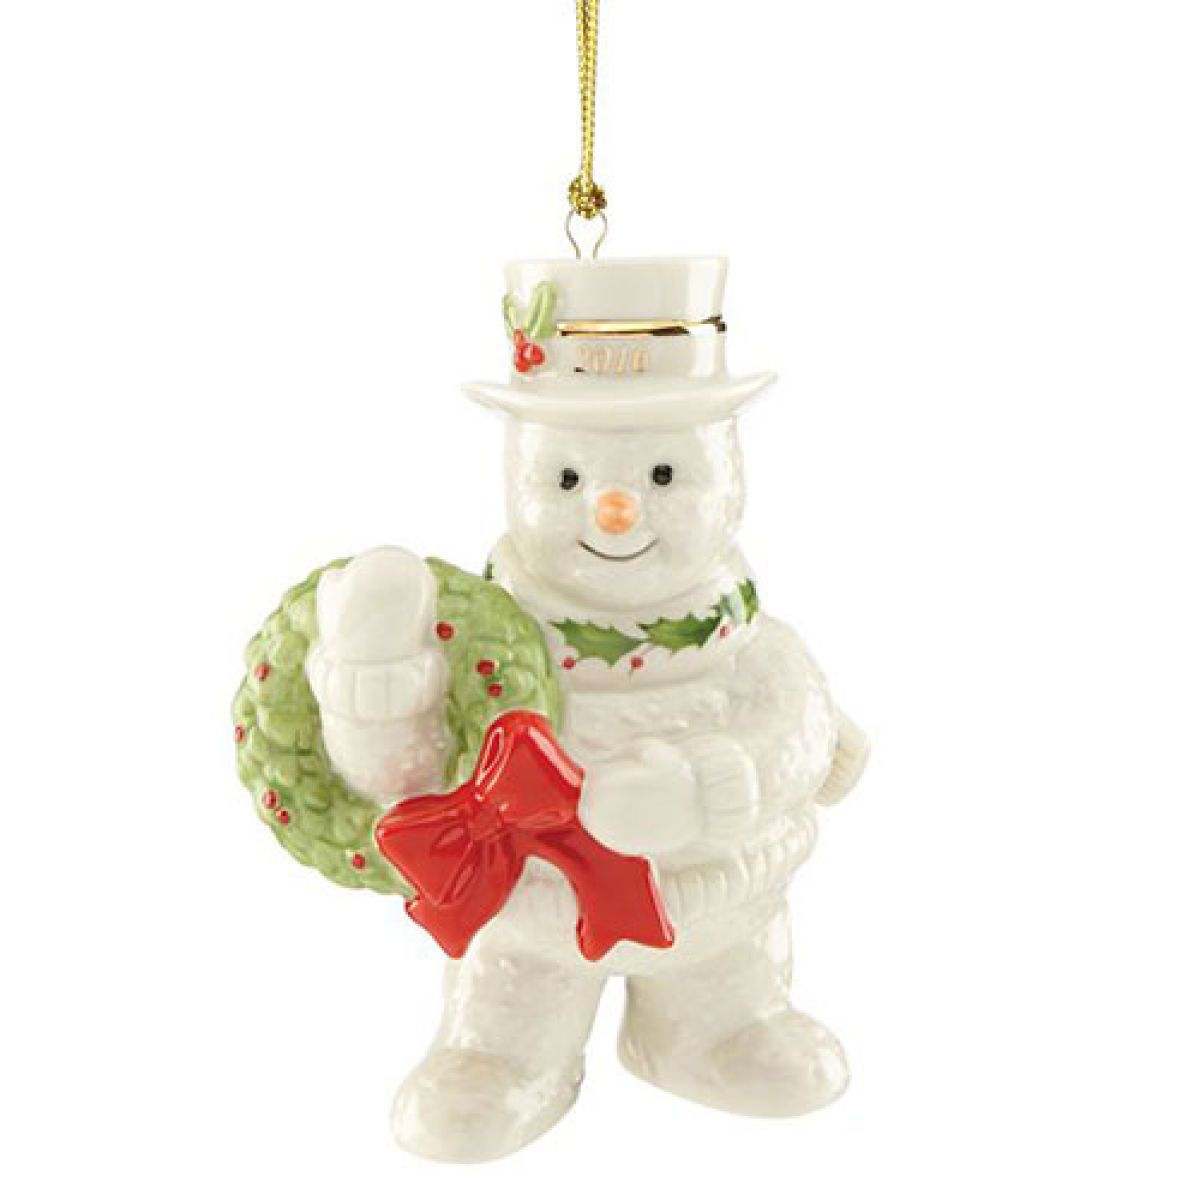 lenox 2016 happy holly days snowman ornament boscovs lenox christmas ornaments snowman ornaments